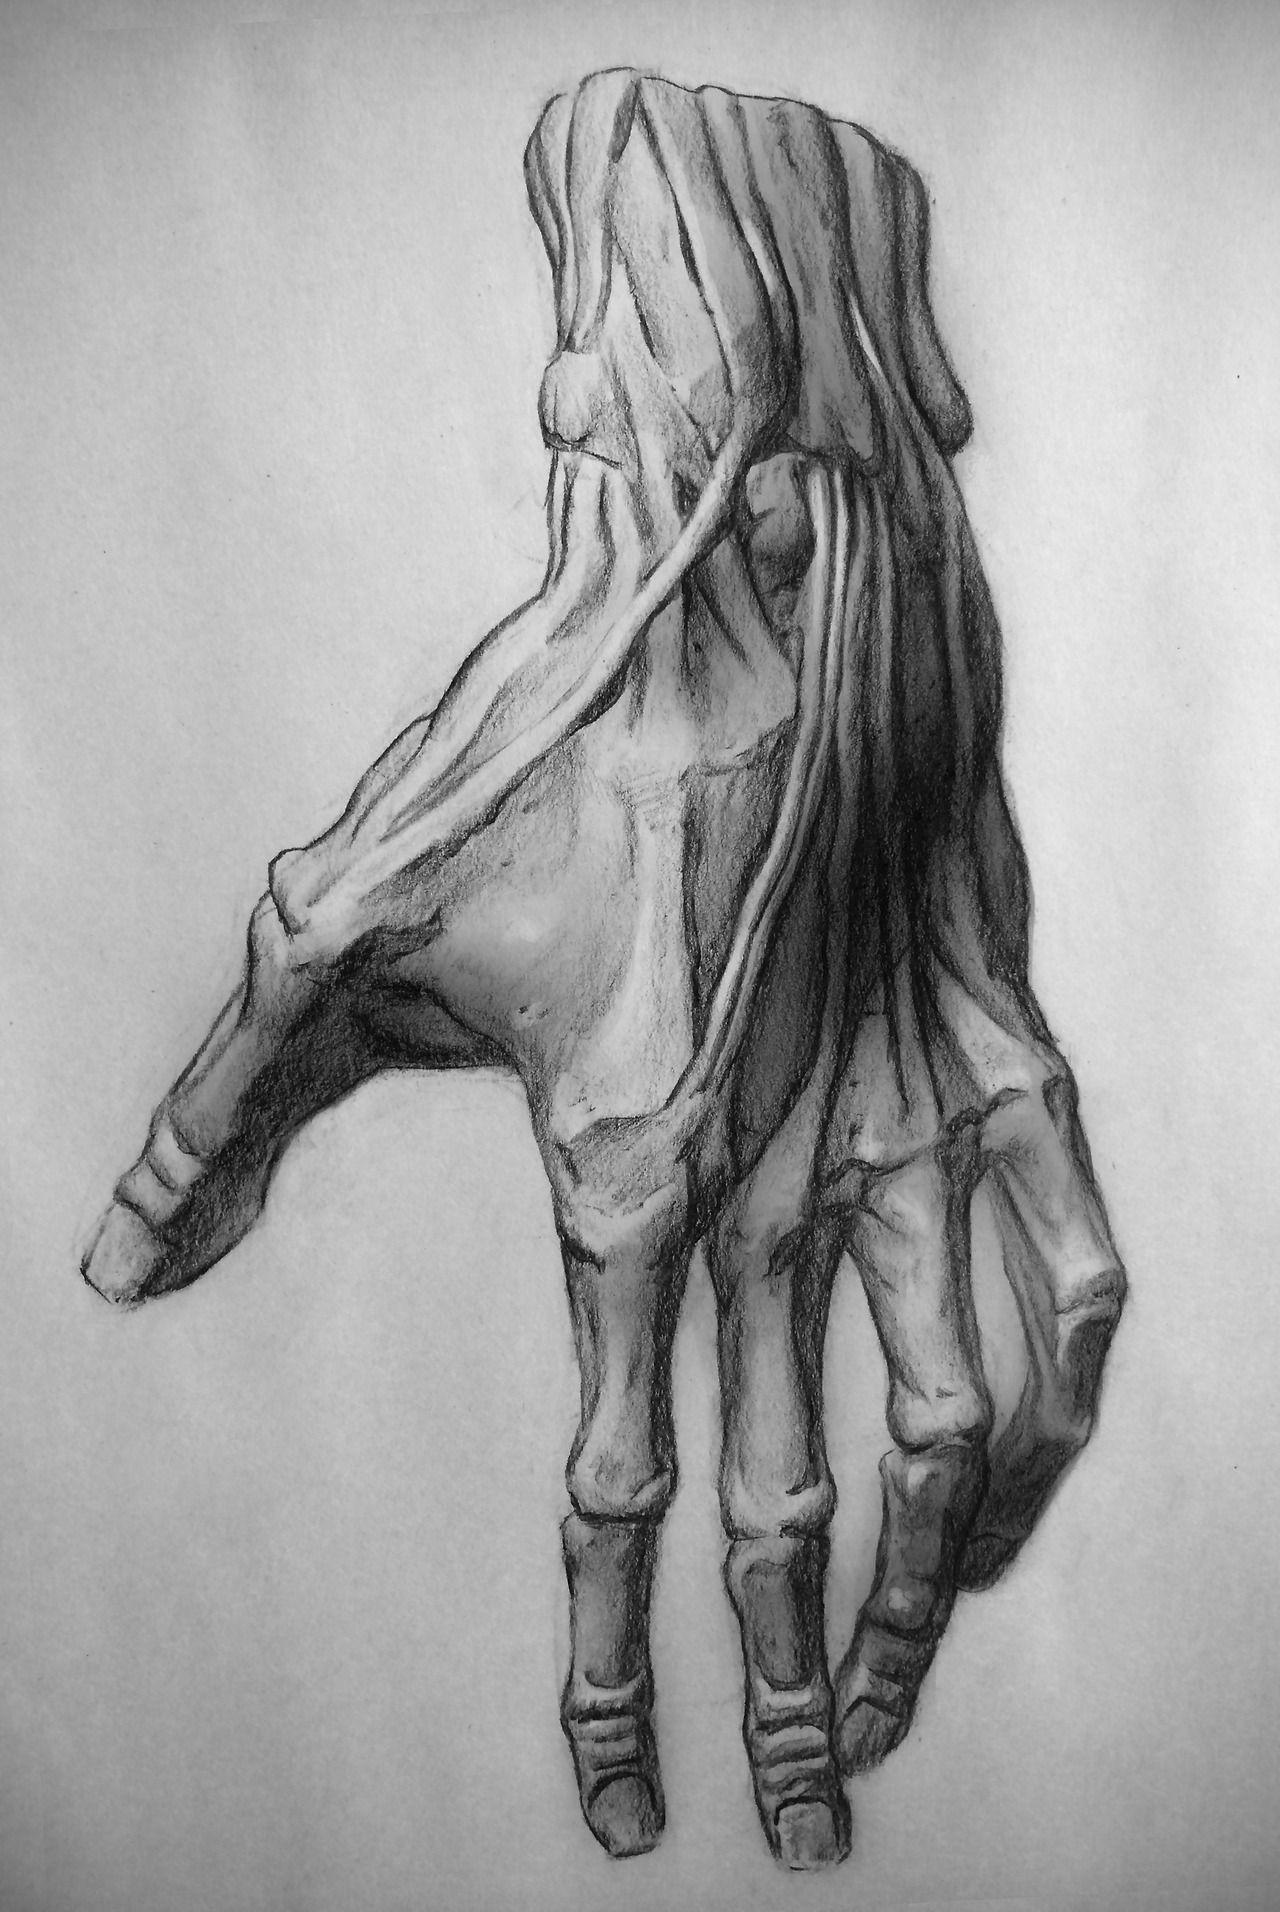 tumblr_n4k0a1YDBo1ss3qfeo1_1280.jpg (1280×1912) | dibujo artistic ...